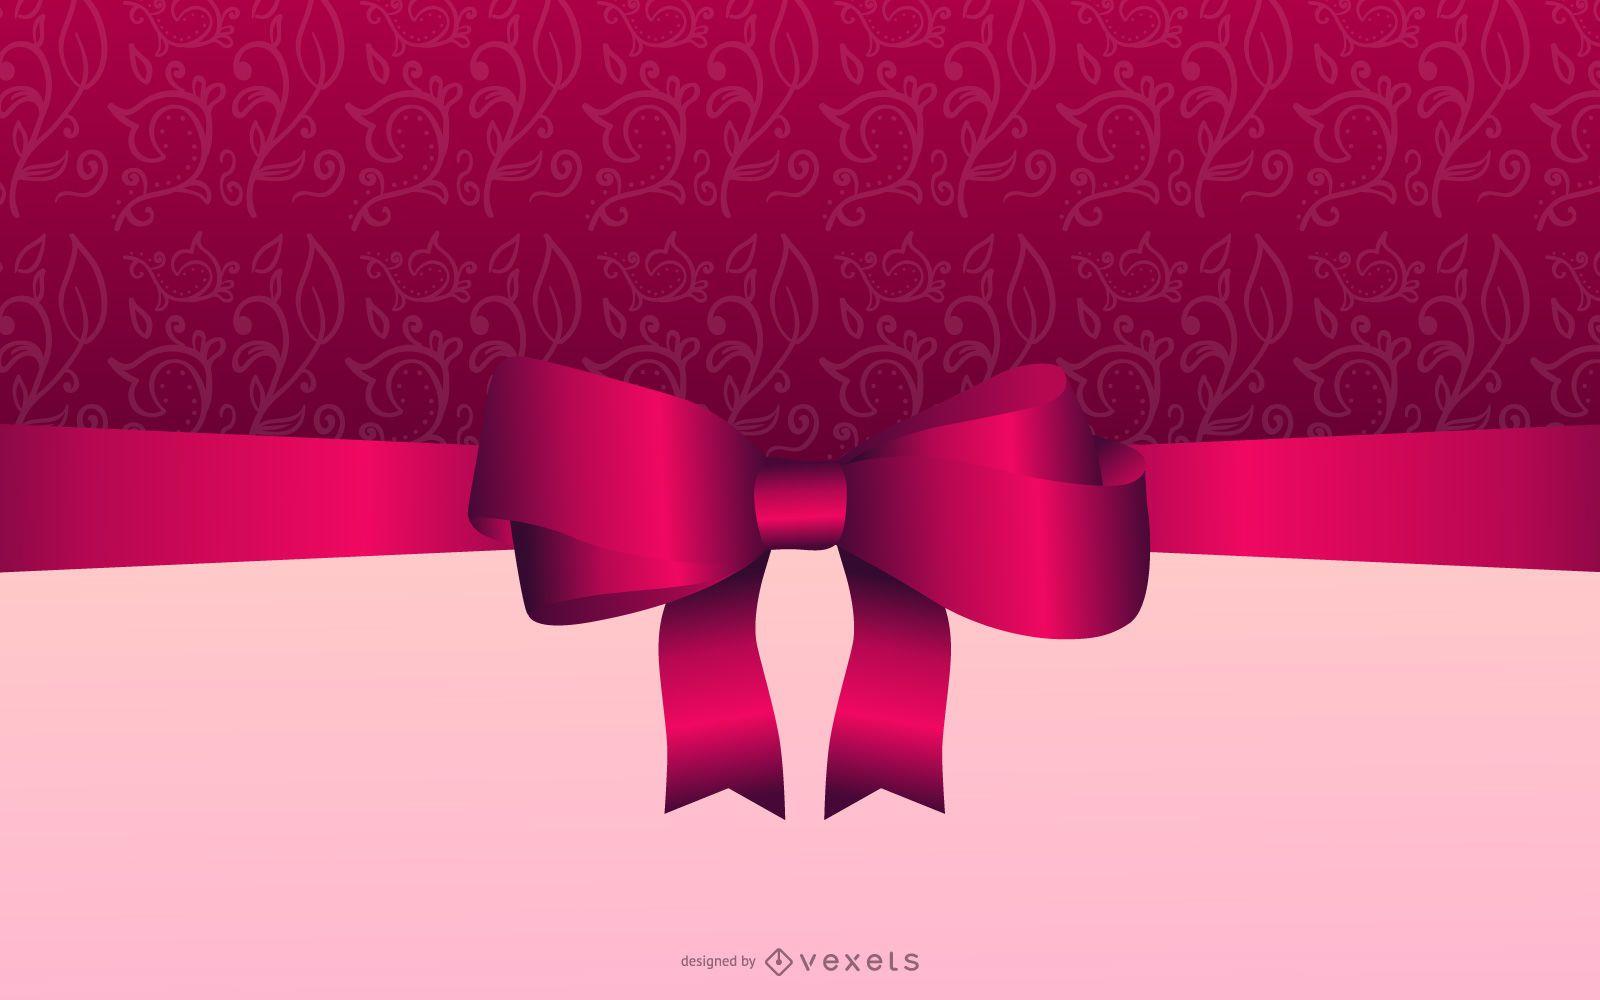 Bright Pinkish Elegant Christmas Card